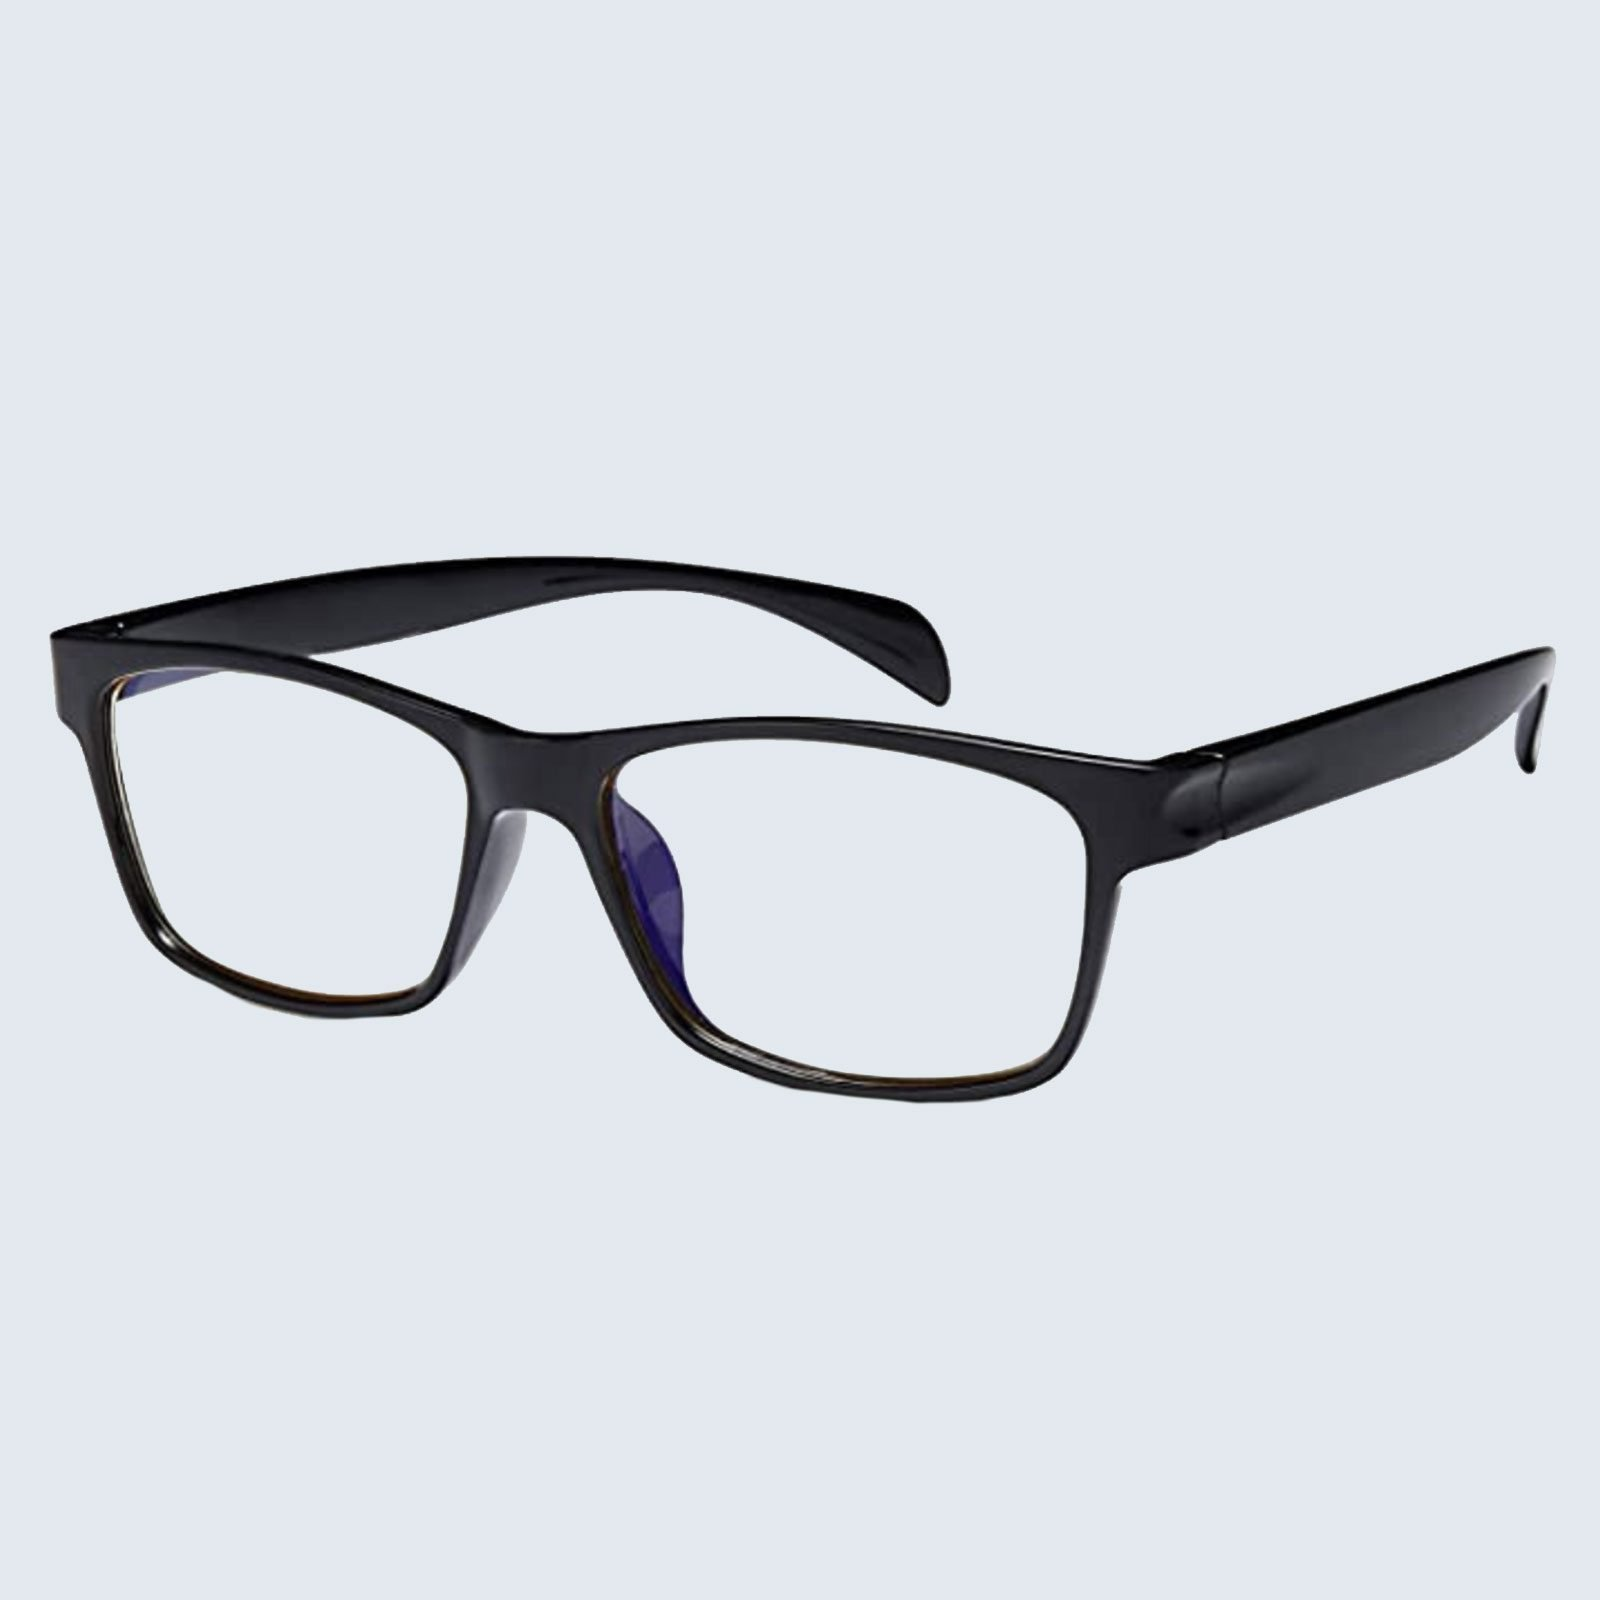 GammaRay Blue Light Glasses